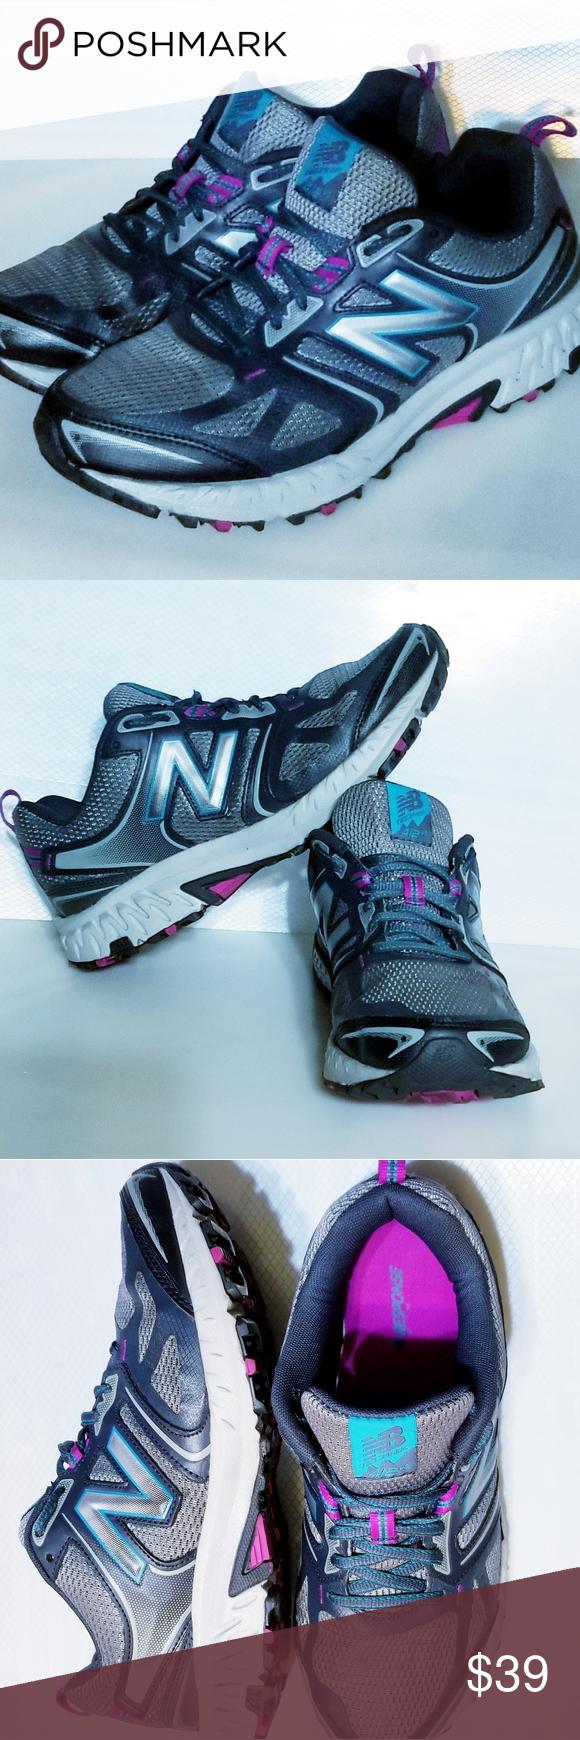 Balance 412 v3 Women's Running Shoes